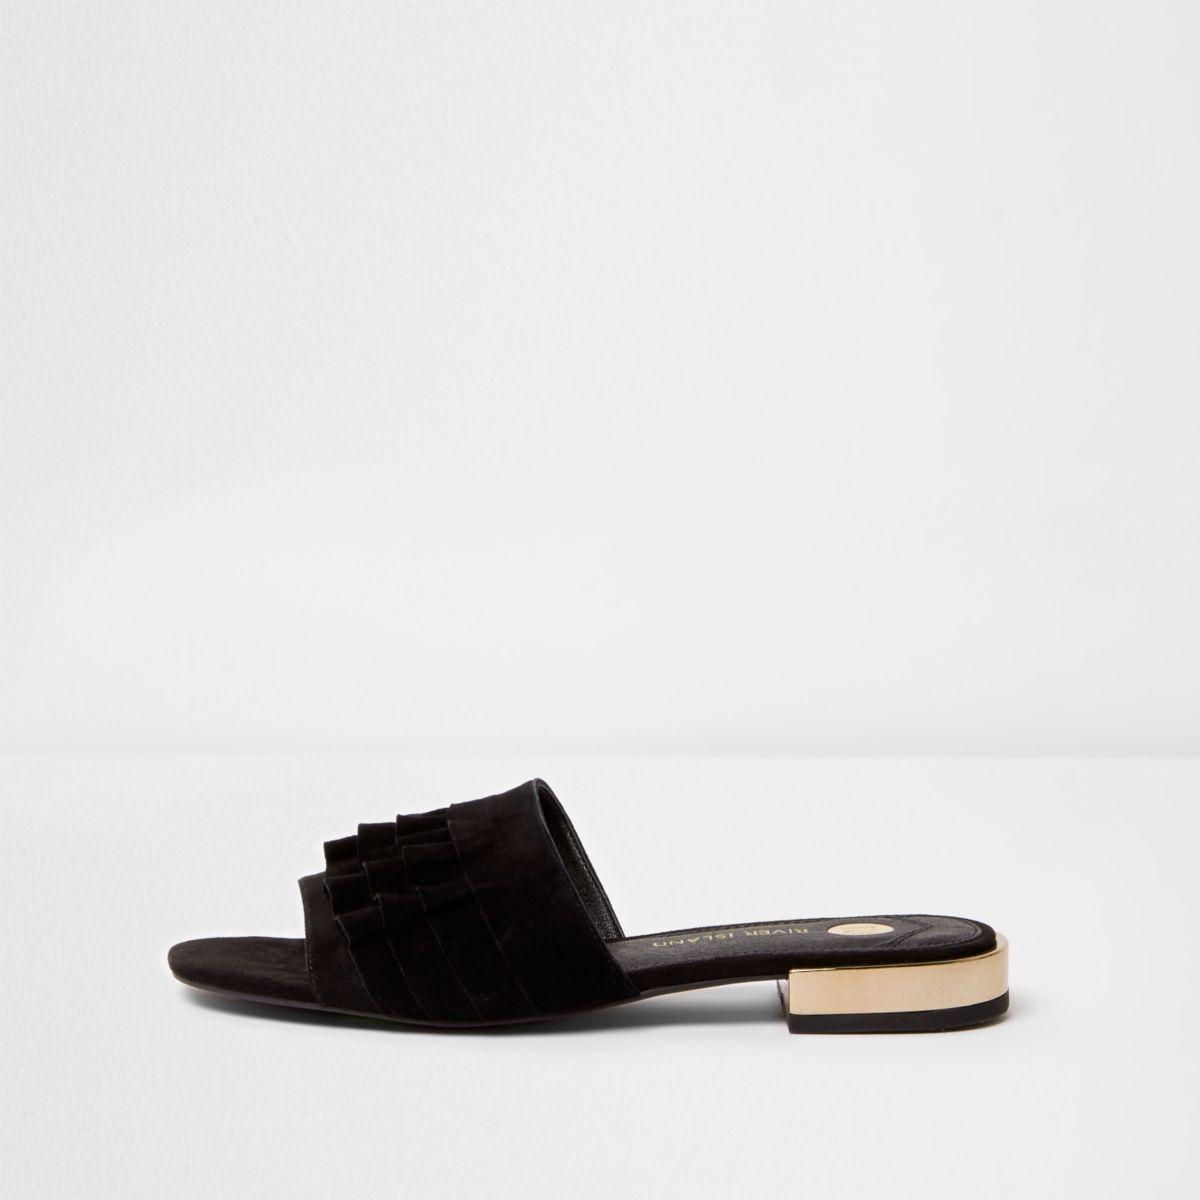 Black suede frill mules